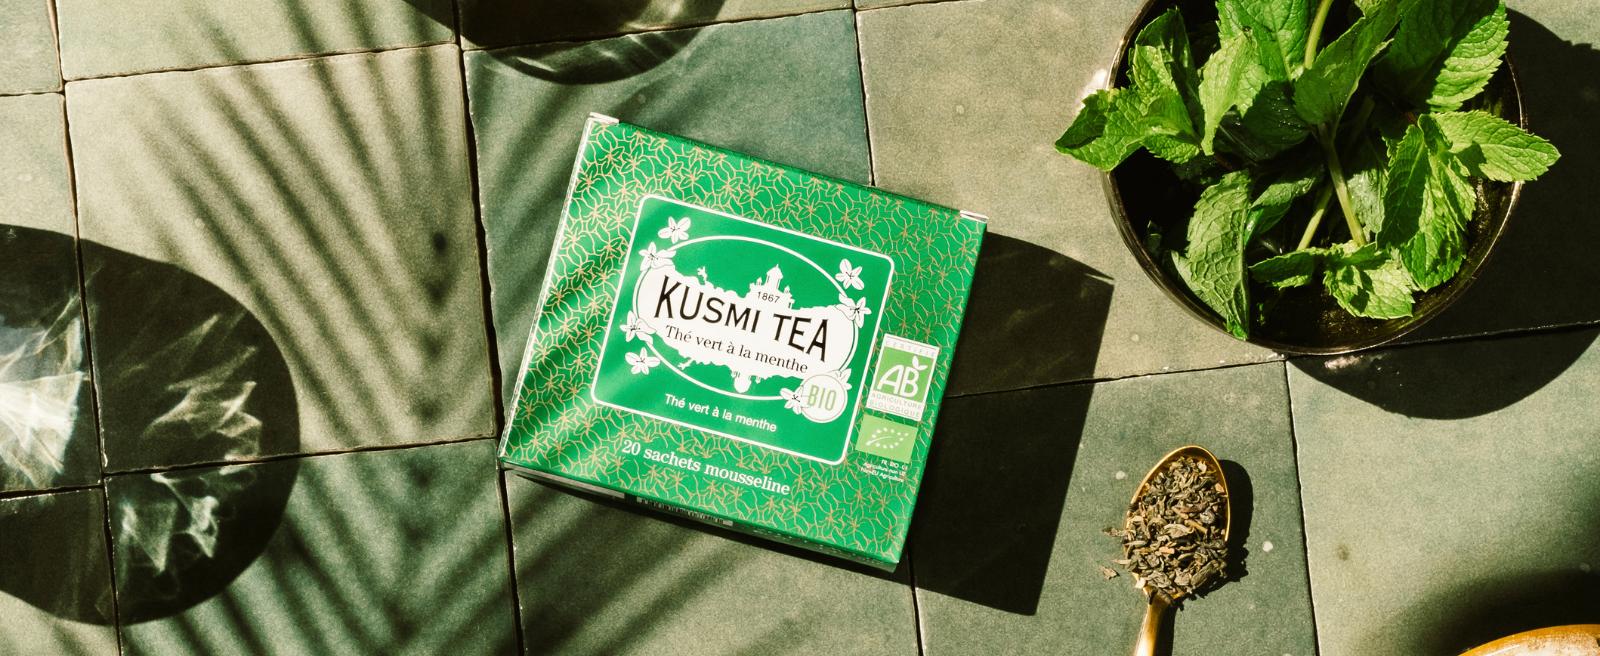 Kusmi Tea - Nailloux Outlet Village